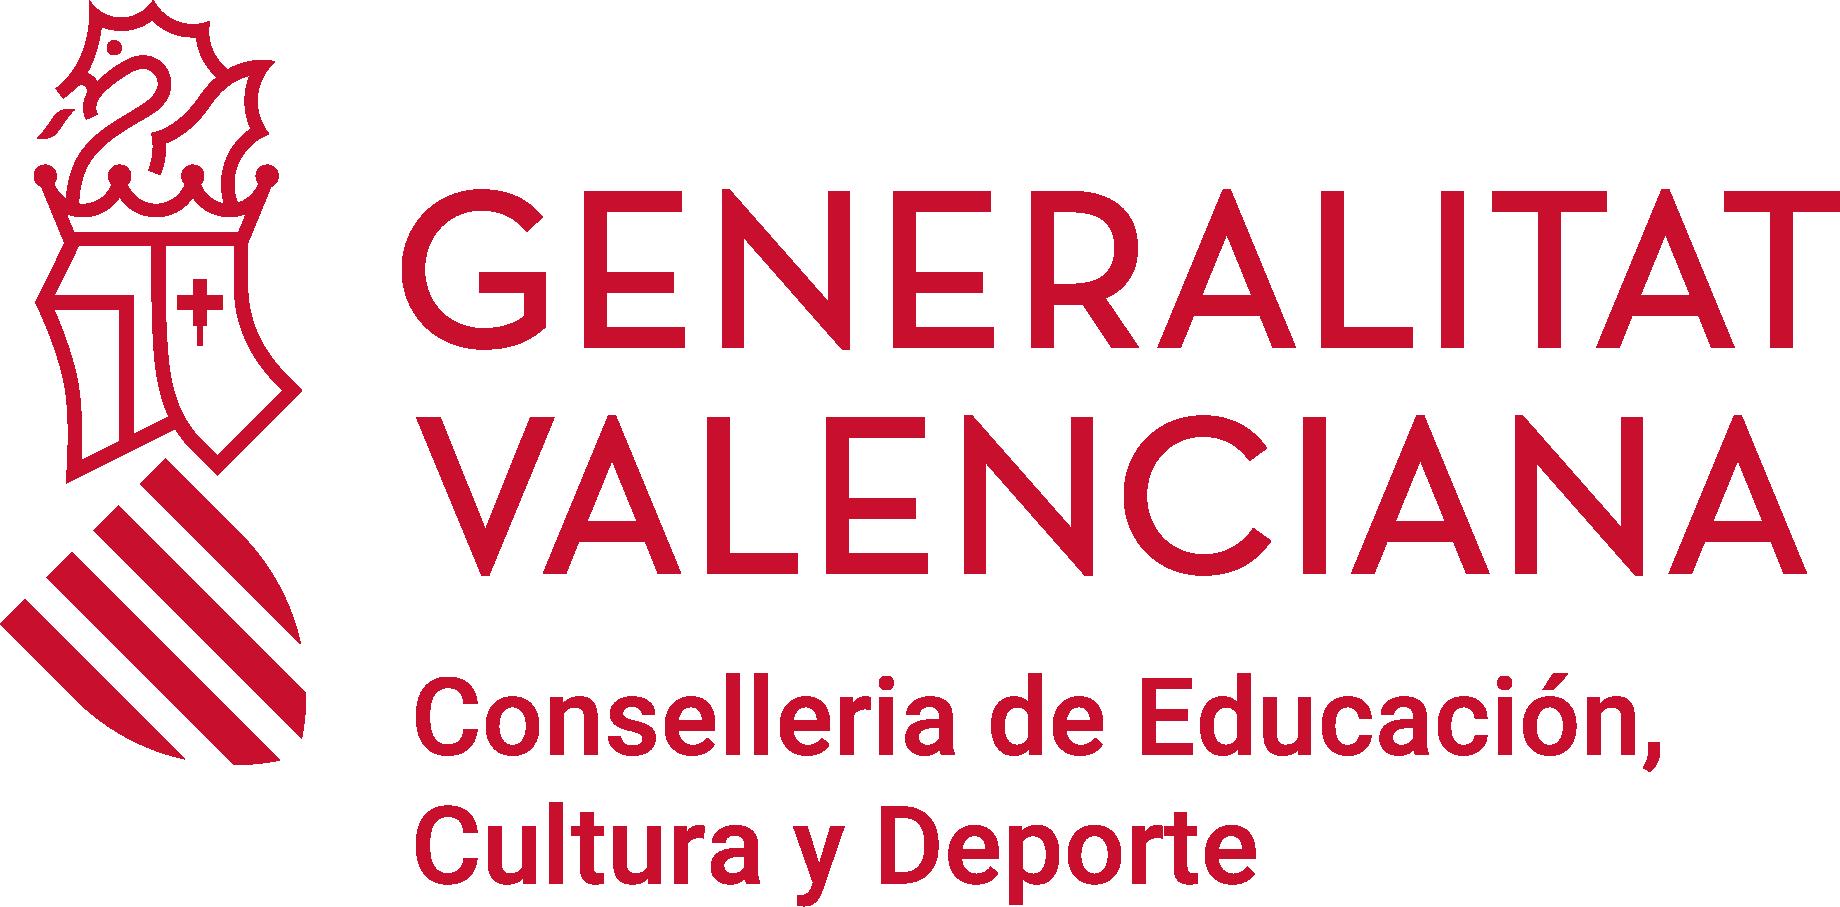 Deporte Generalitat Valenciana